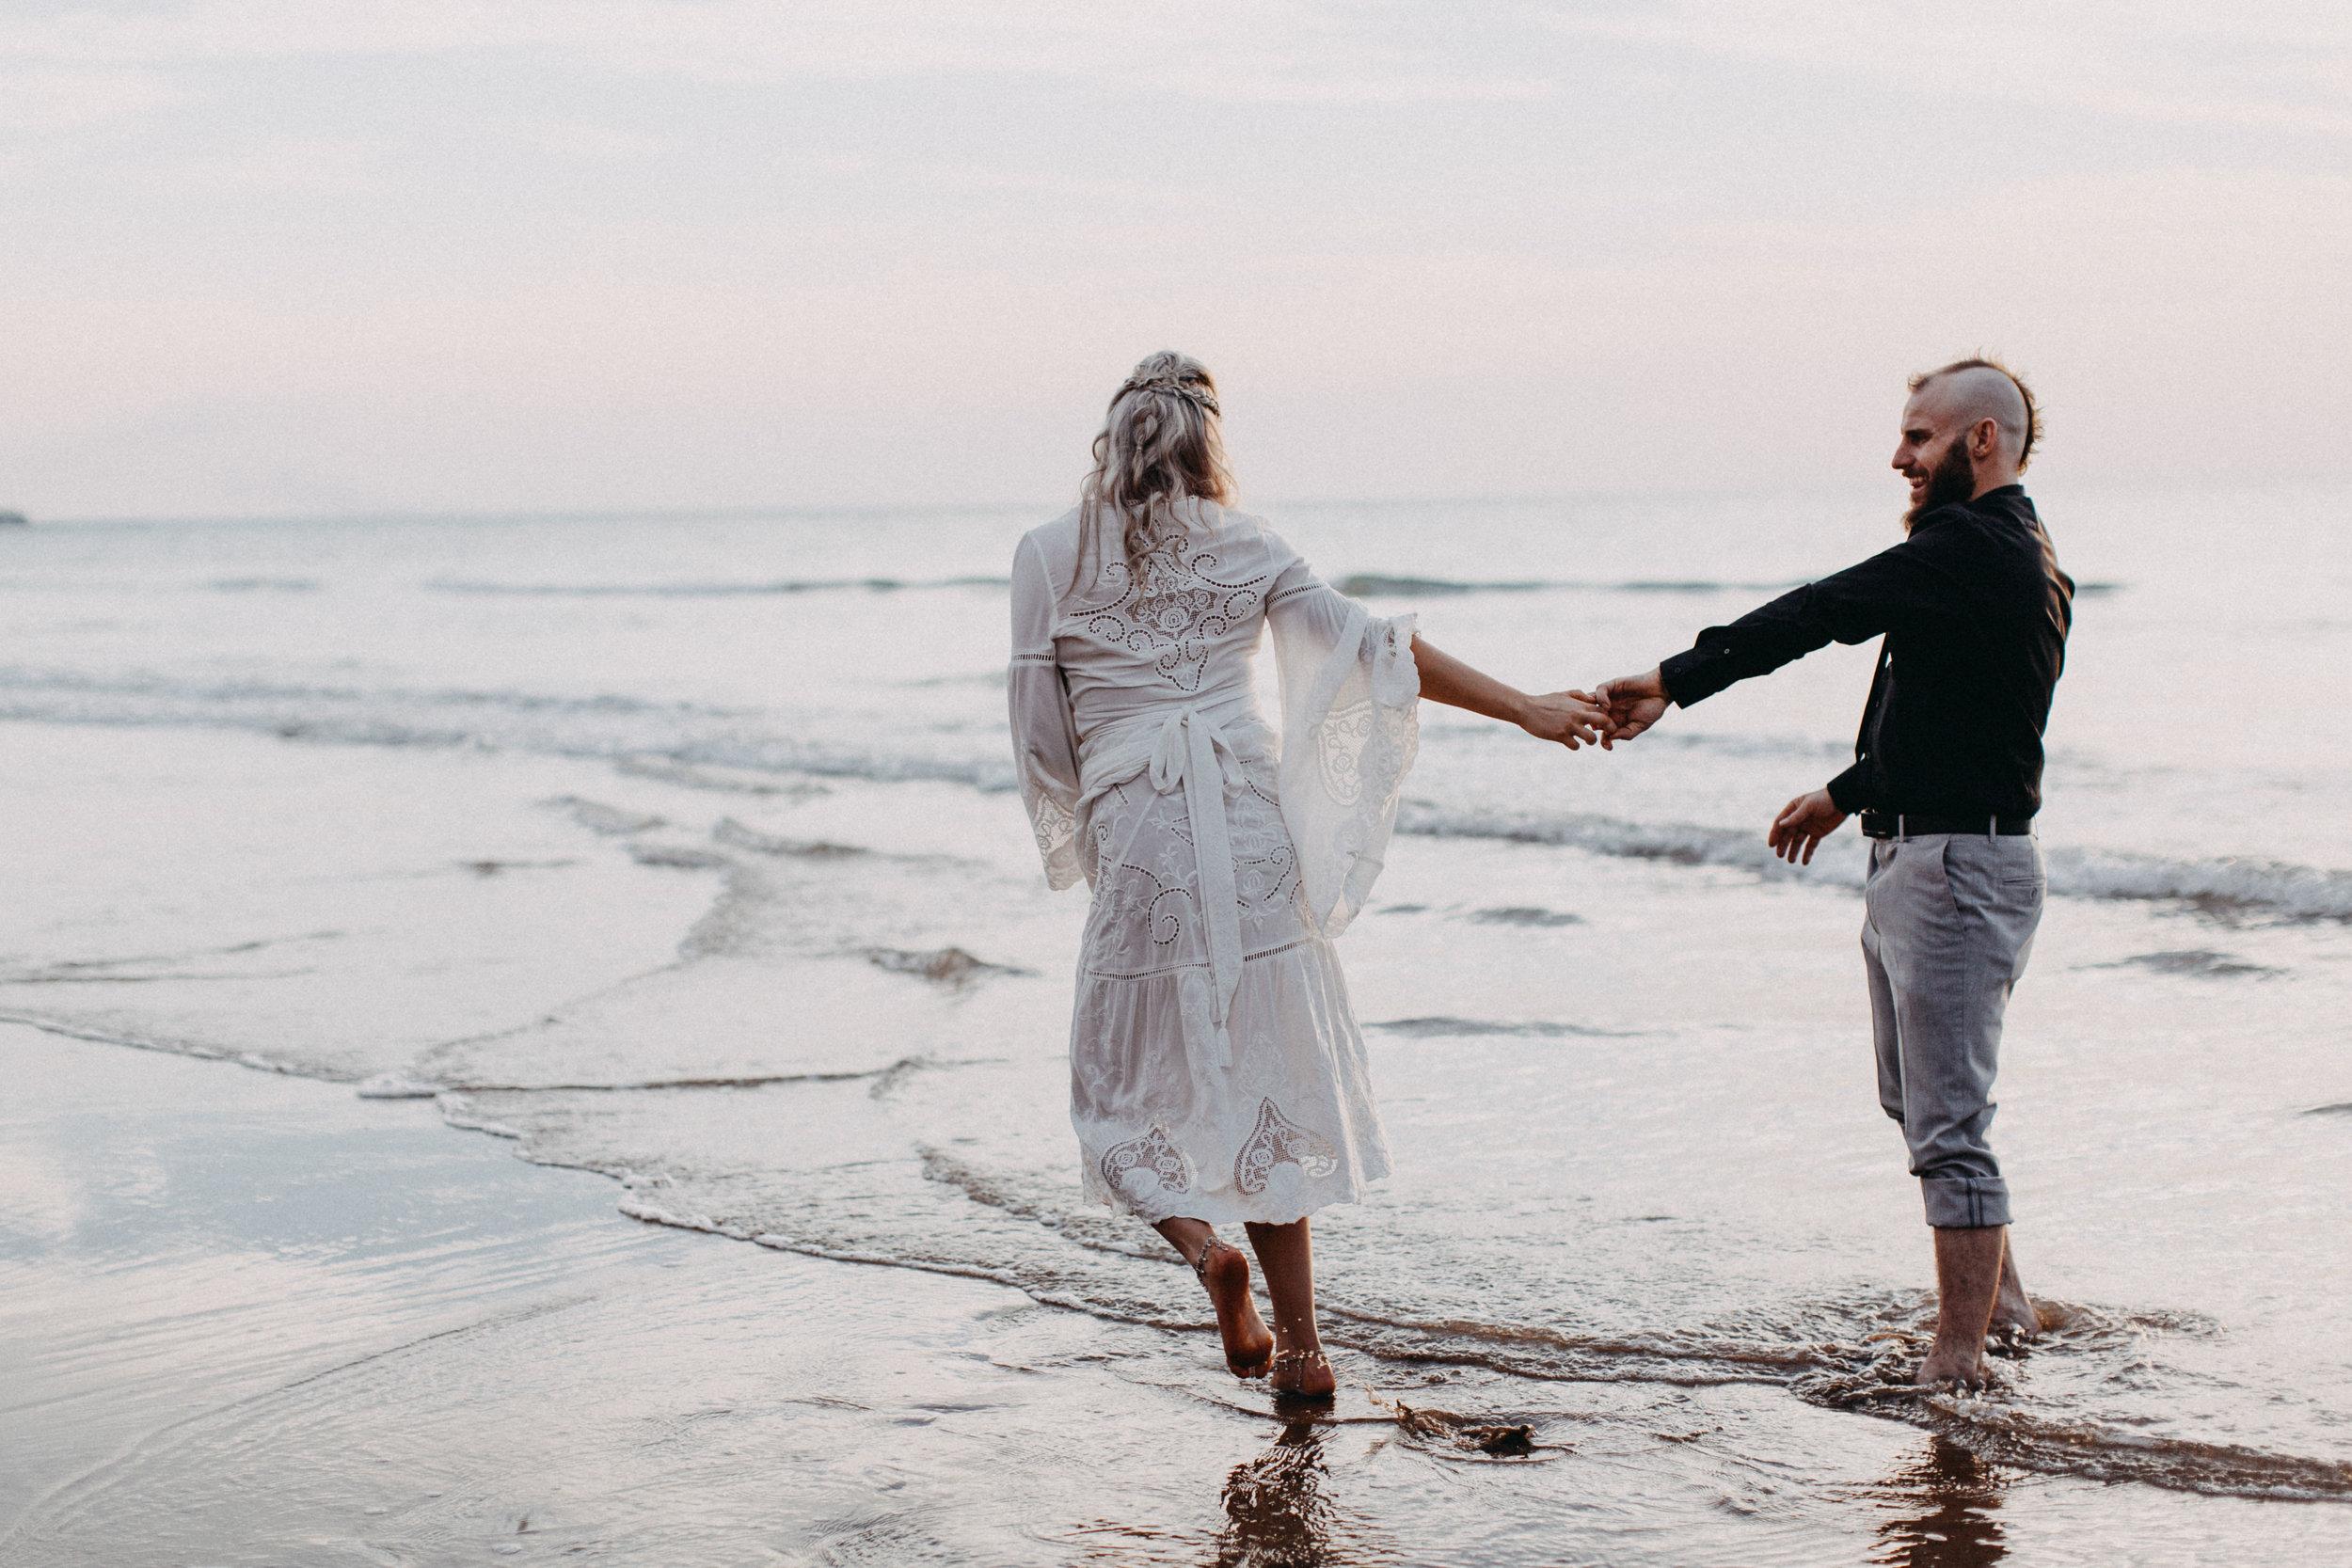 darwin-elopement-wedding-beach-camden-photography-www.emilyobrienphotography.net-74.jpg